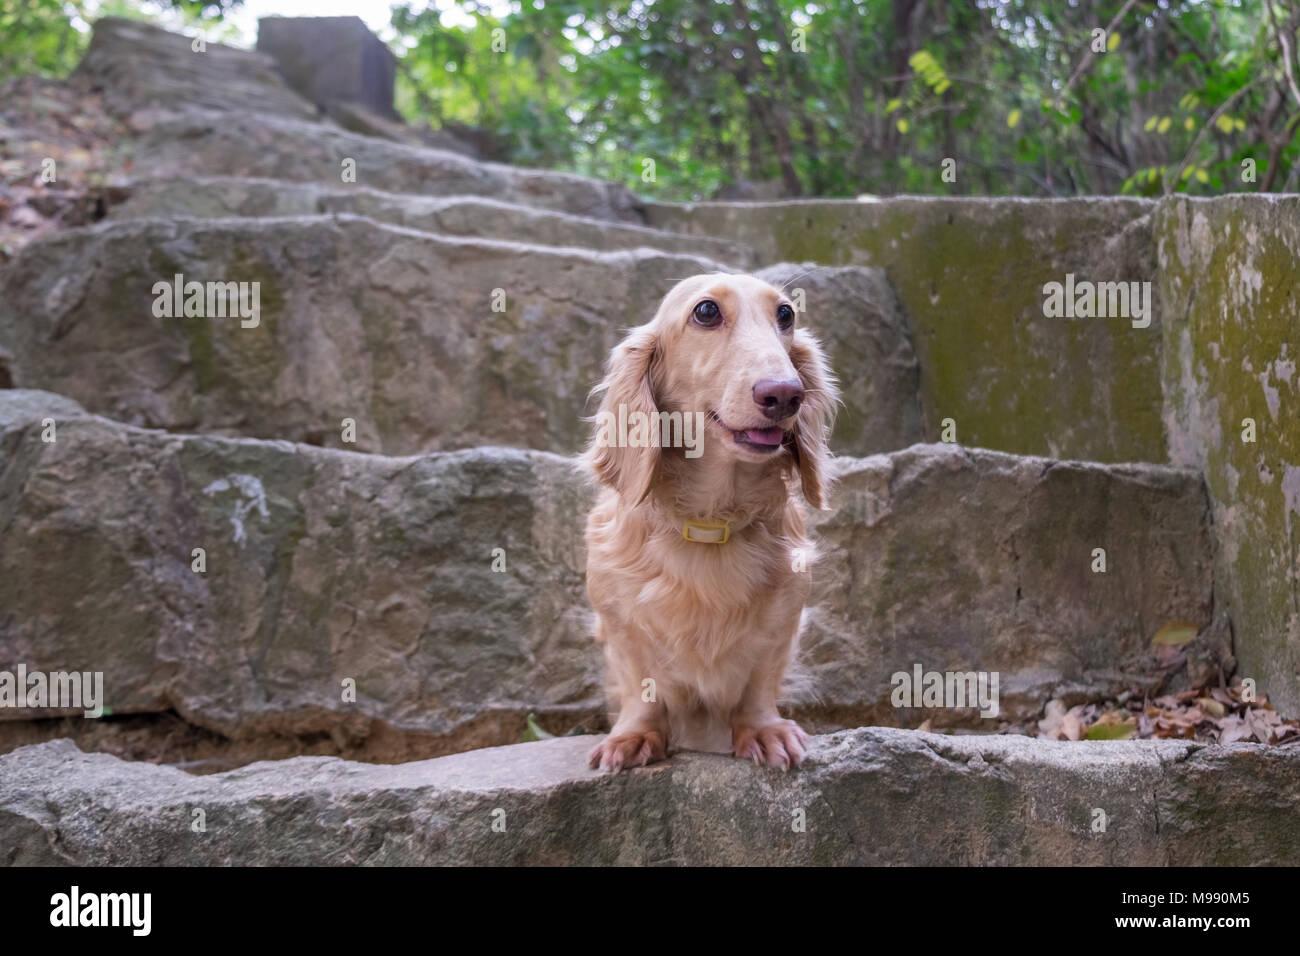 Sitting canine dog most popular dog stock photos sitting for Dog day sitting